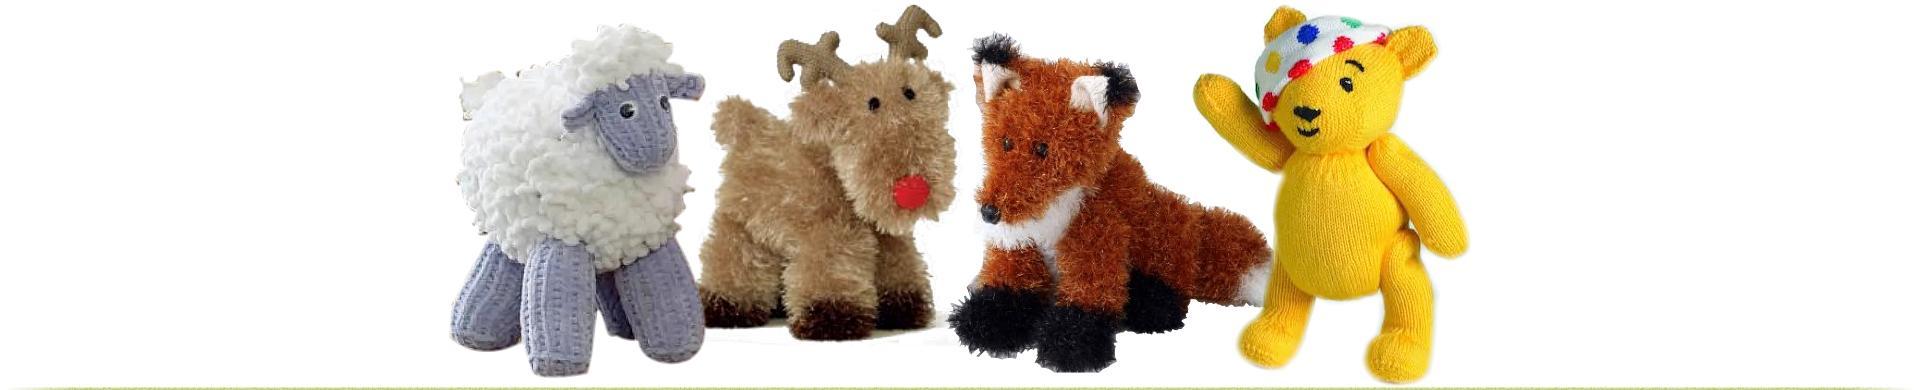 Crochet, Knitting & Soft Toy Making